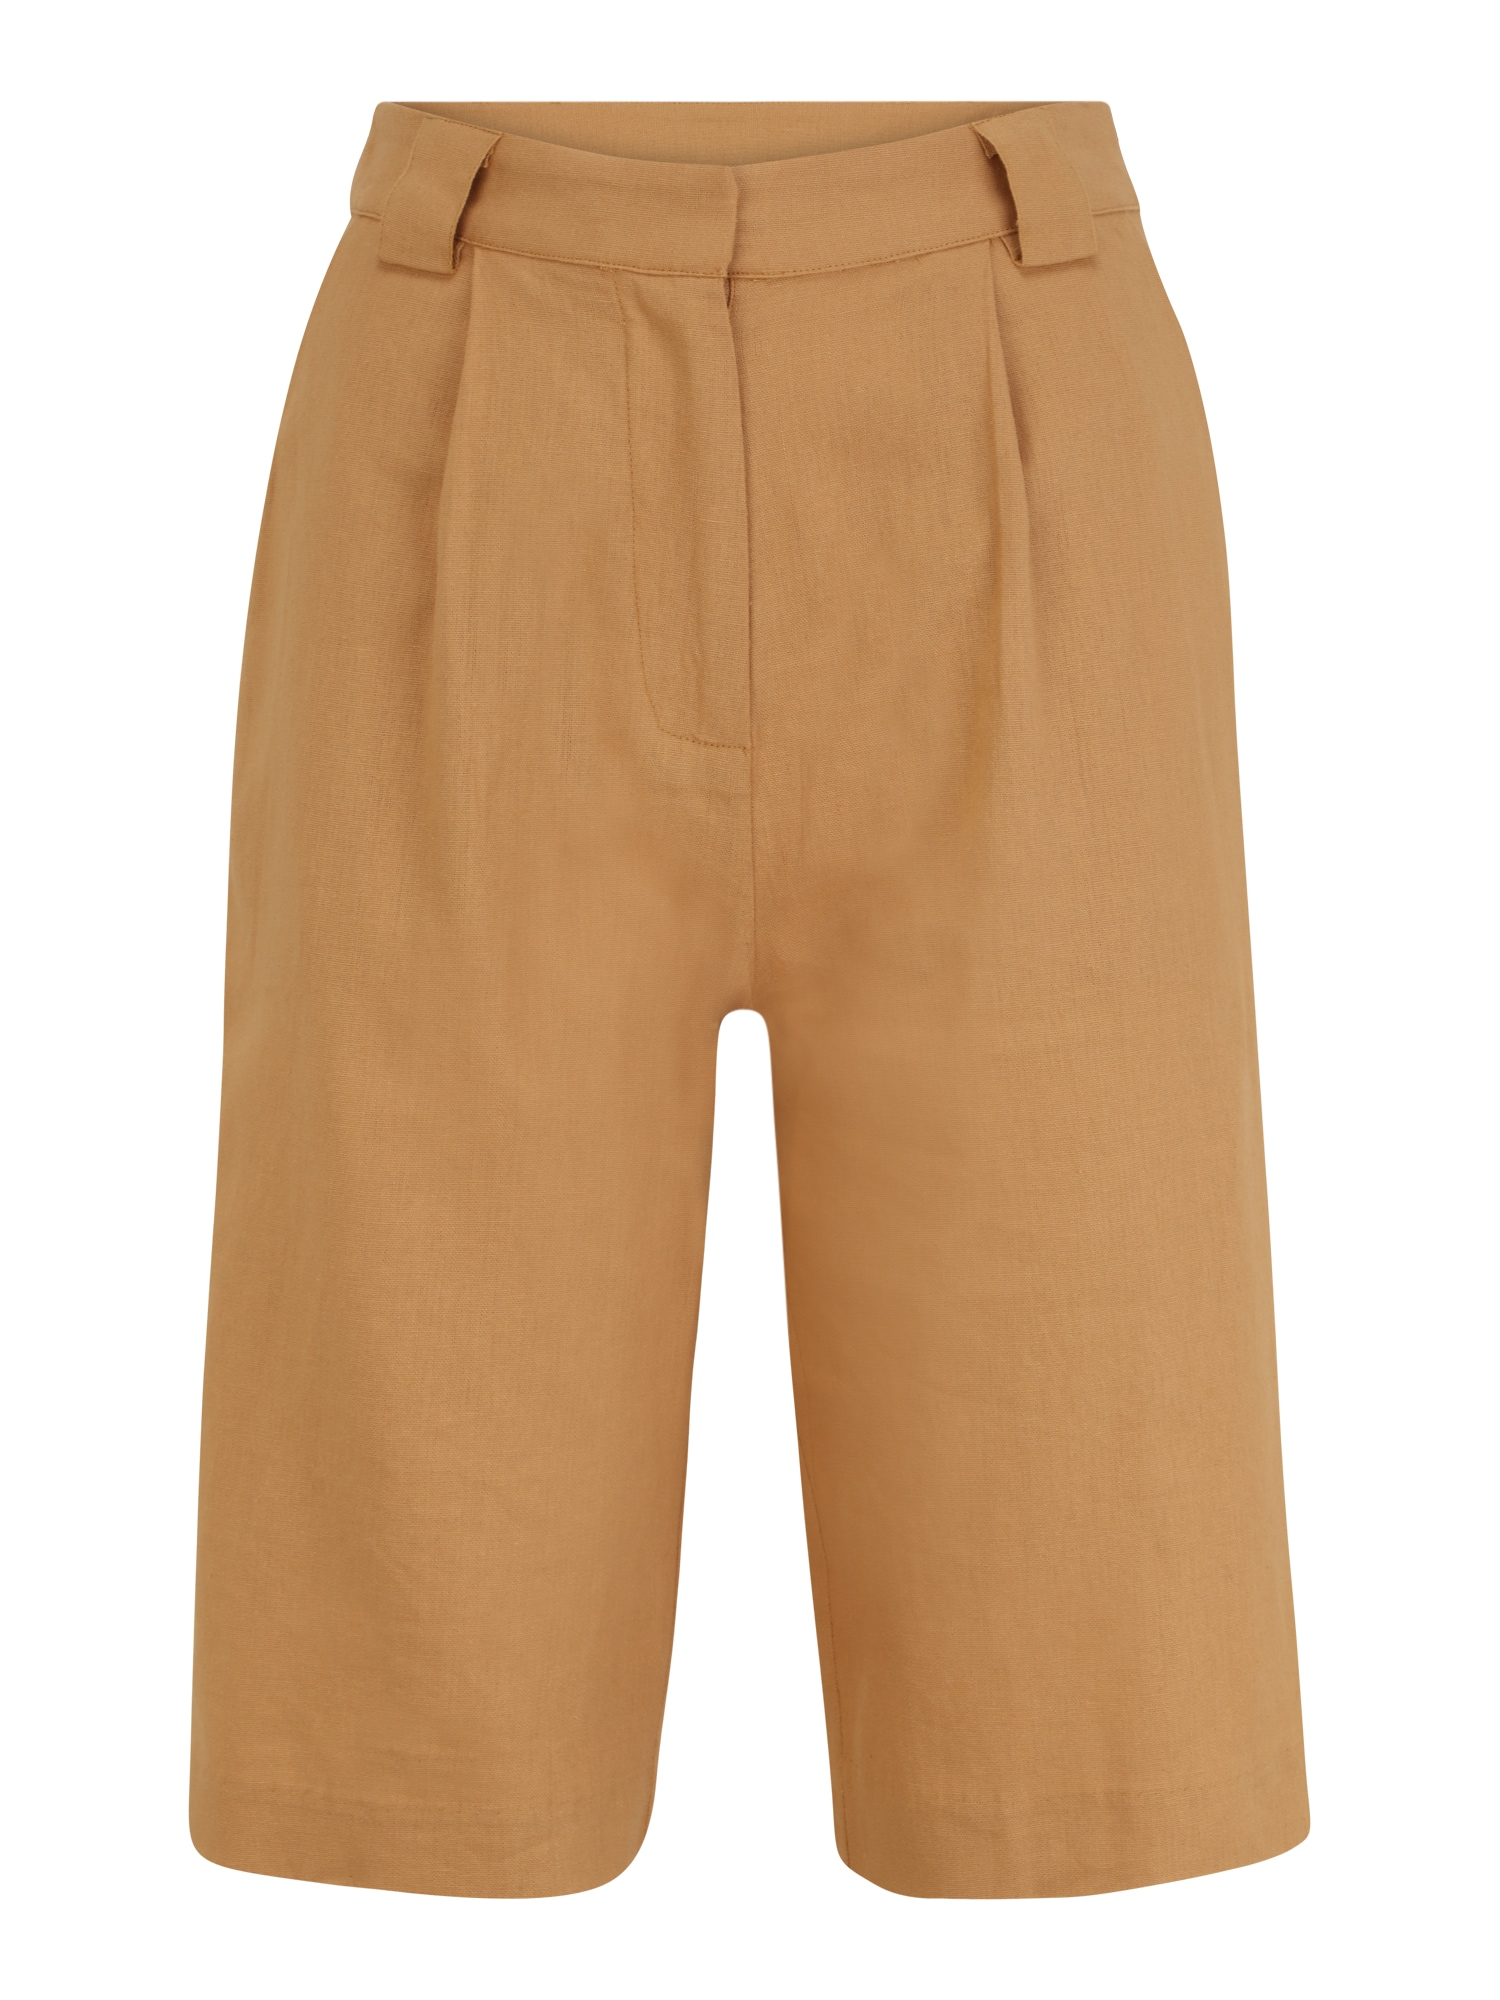 Y.A.S (Tall) Klostuotos kelnės